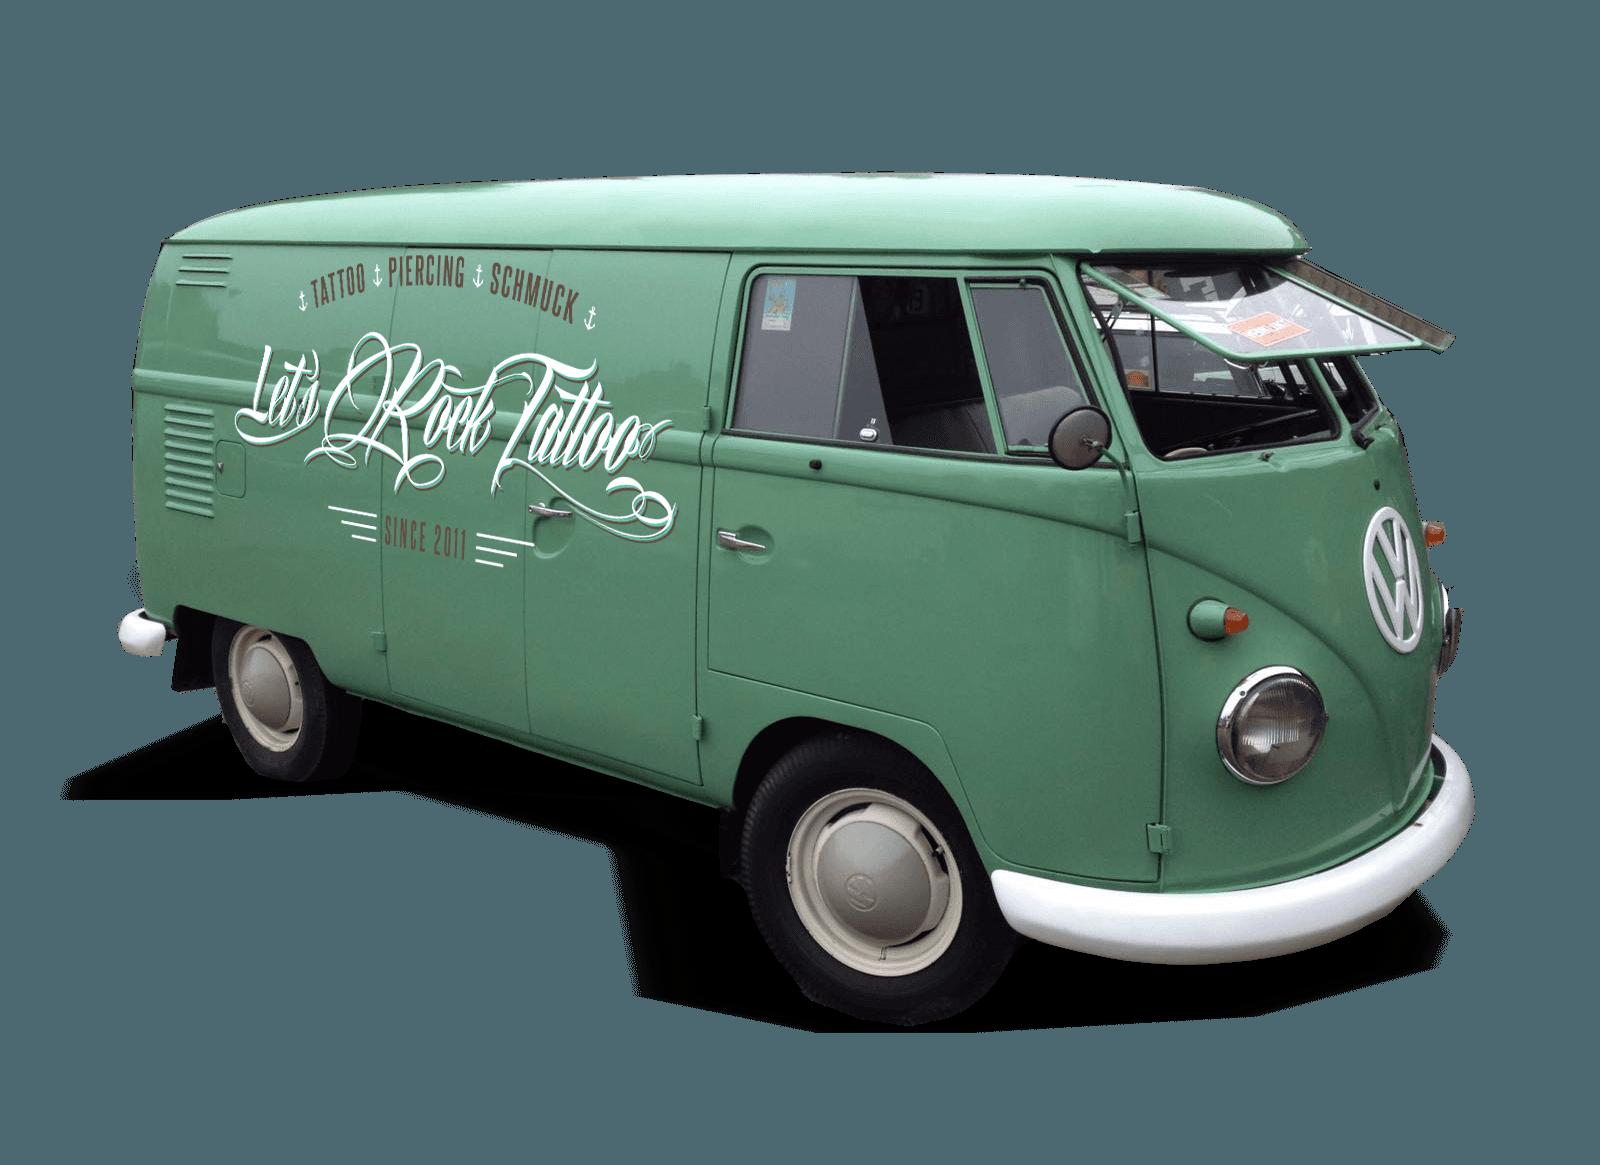 LETS ROCK TATTOO – Gestaltung und Beschriftung